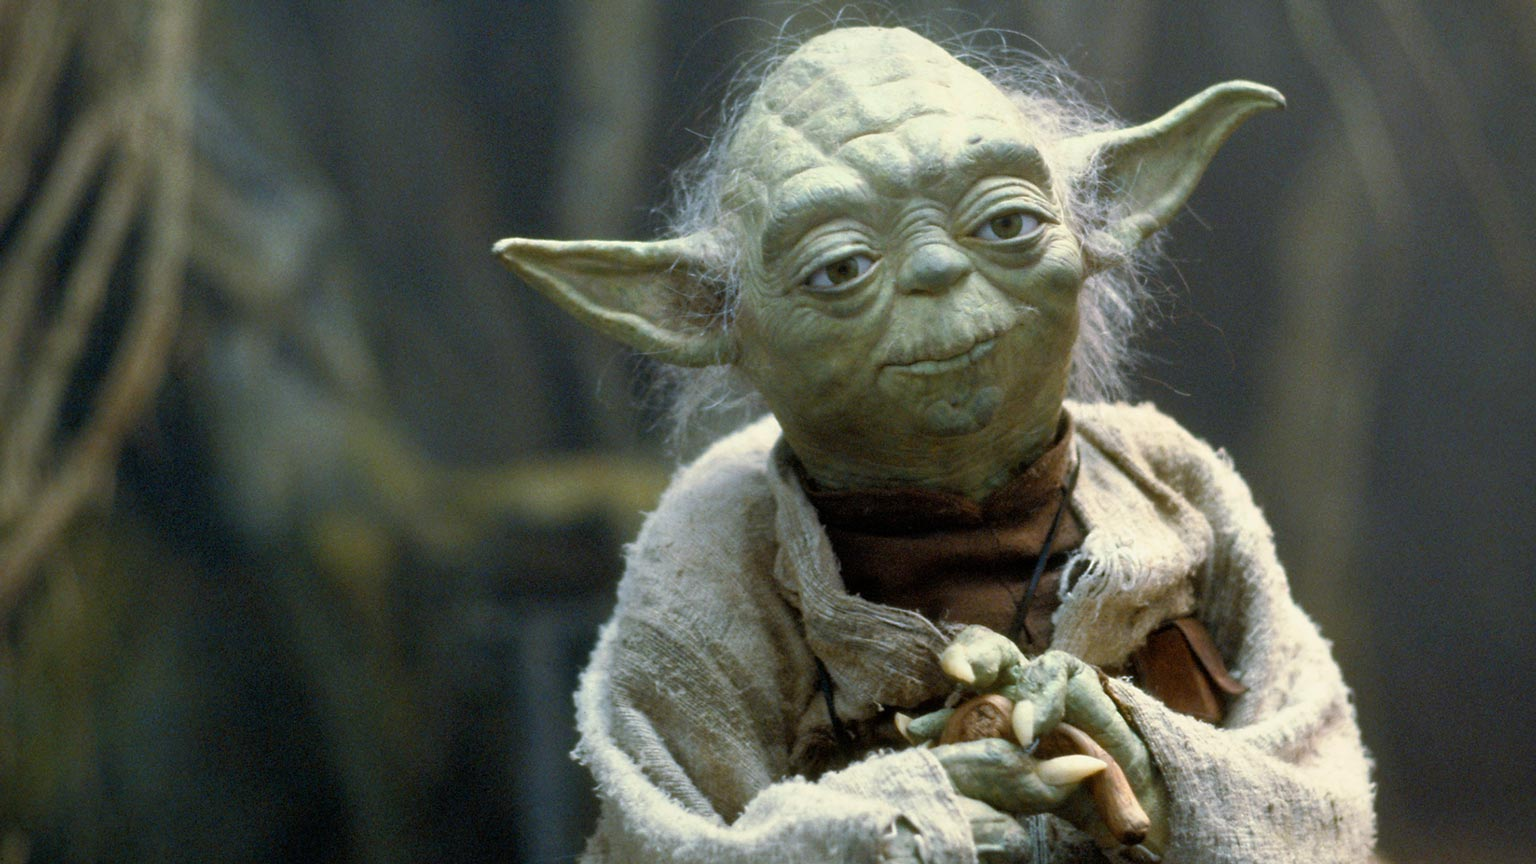 Frank Oz to voice Yoda in Star Wars: Rebels